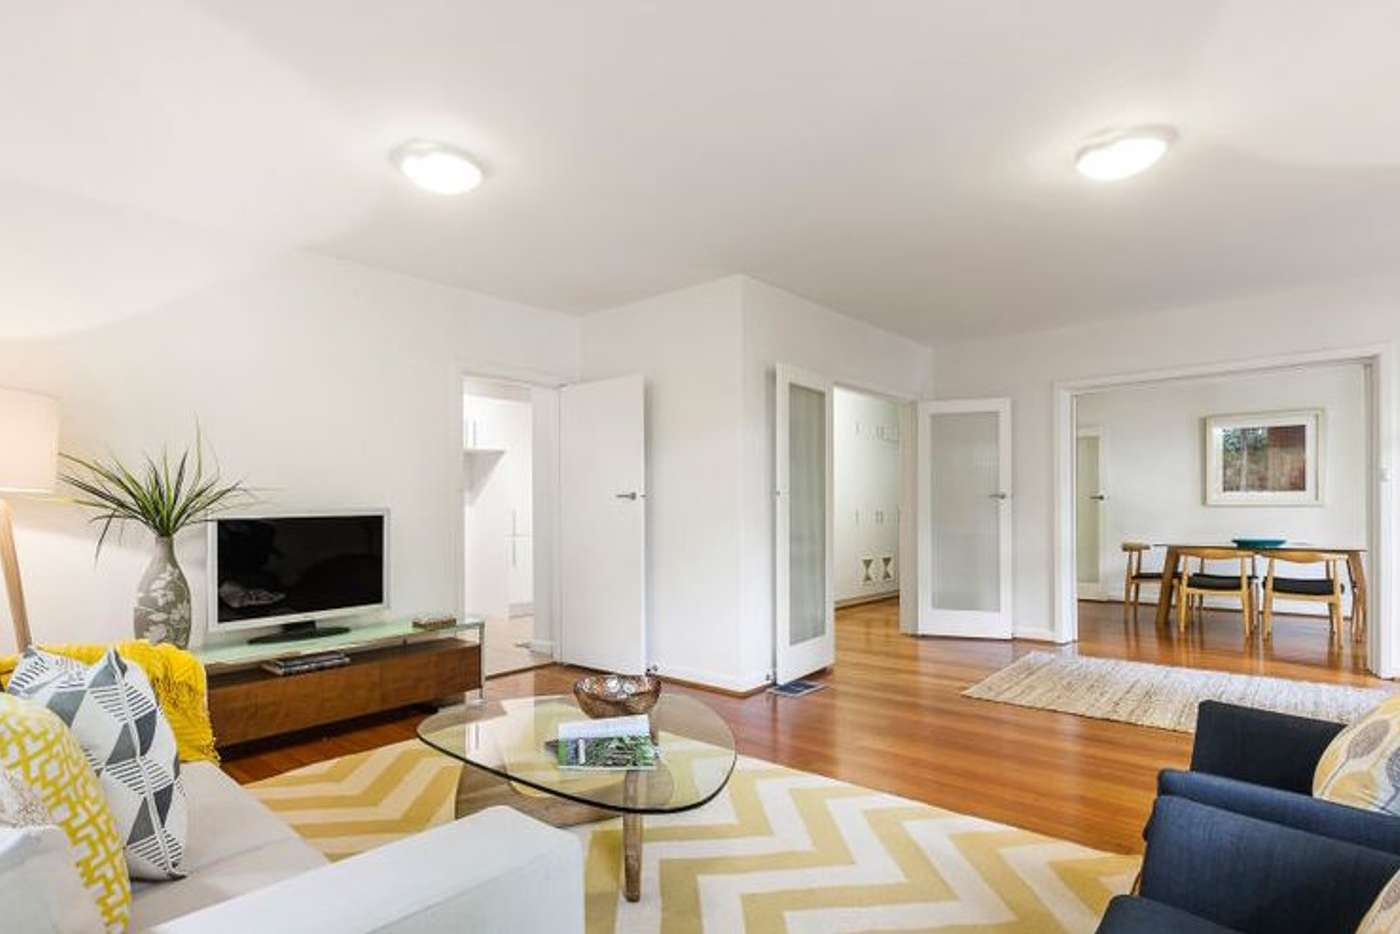 Main view of Homely apartment listing, 1/492 Dandenong Road, Caulfield North VIC 3161